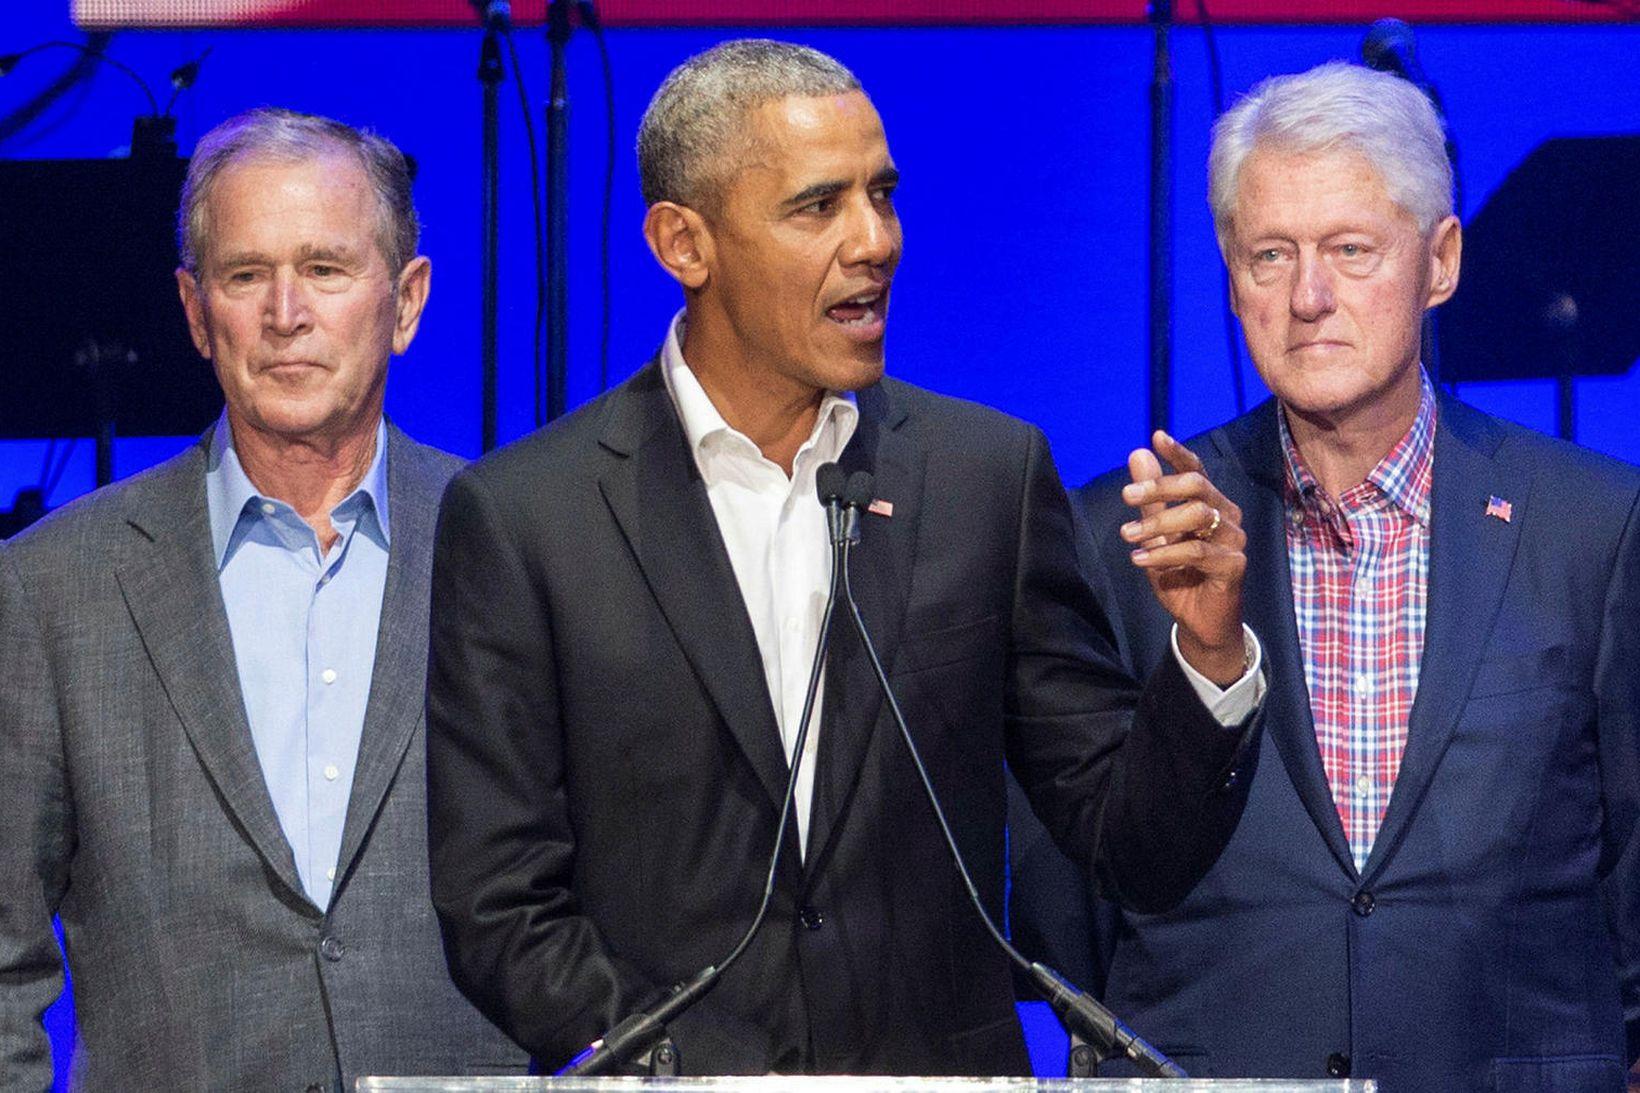 Frá vinstri George W. Bush, Barack Obama og Bill Clinton.